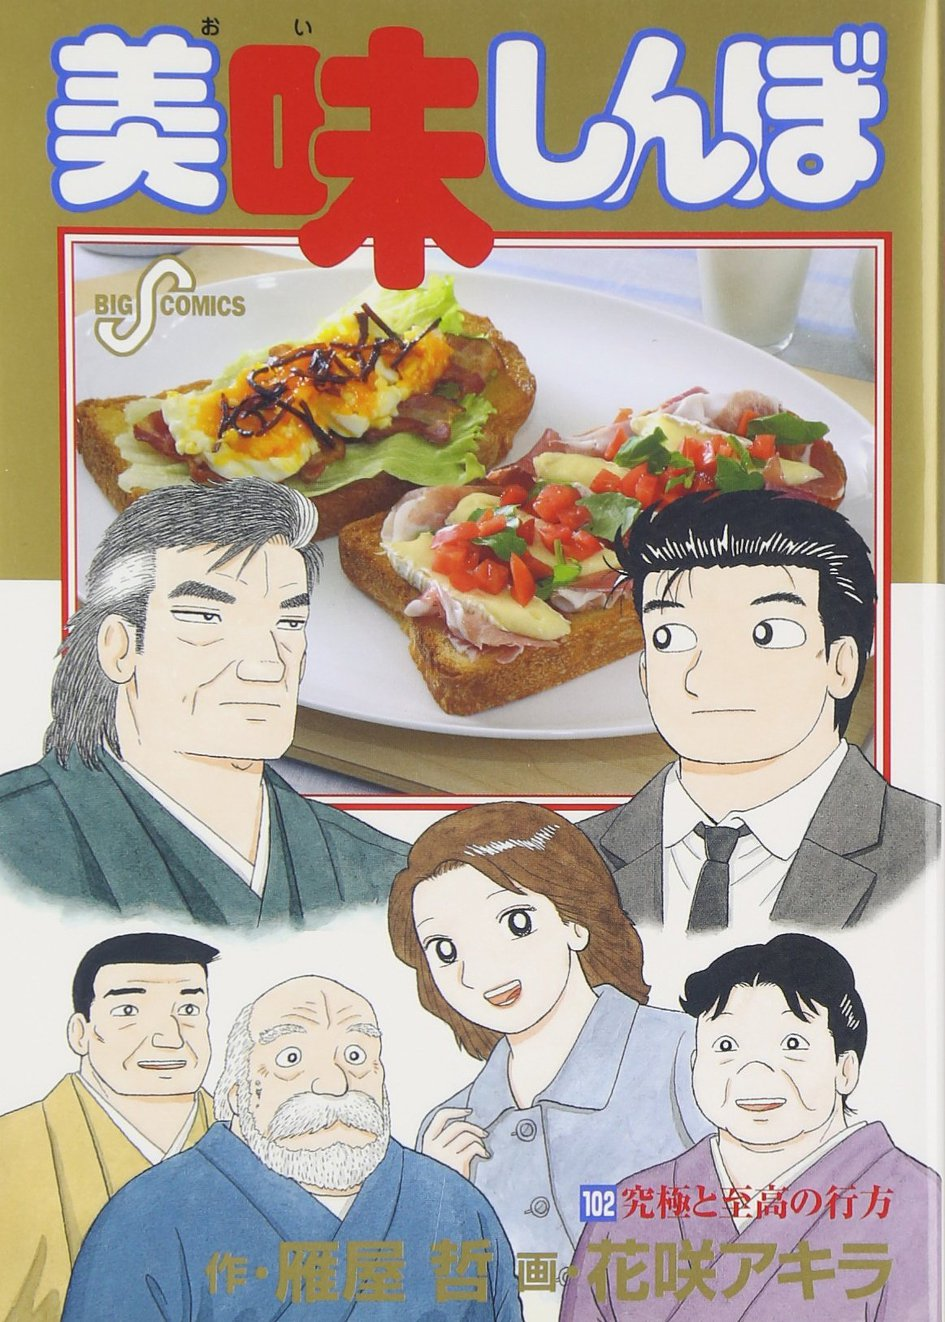 10 Judul Manga Yang Terpopuler di Dunia Sepanjang Masa 9